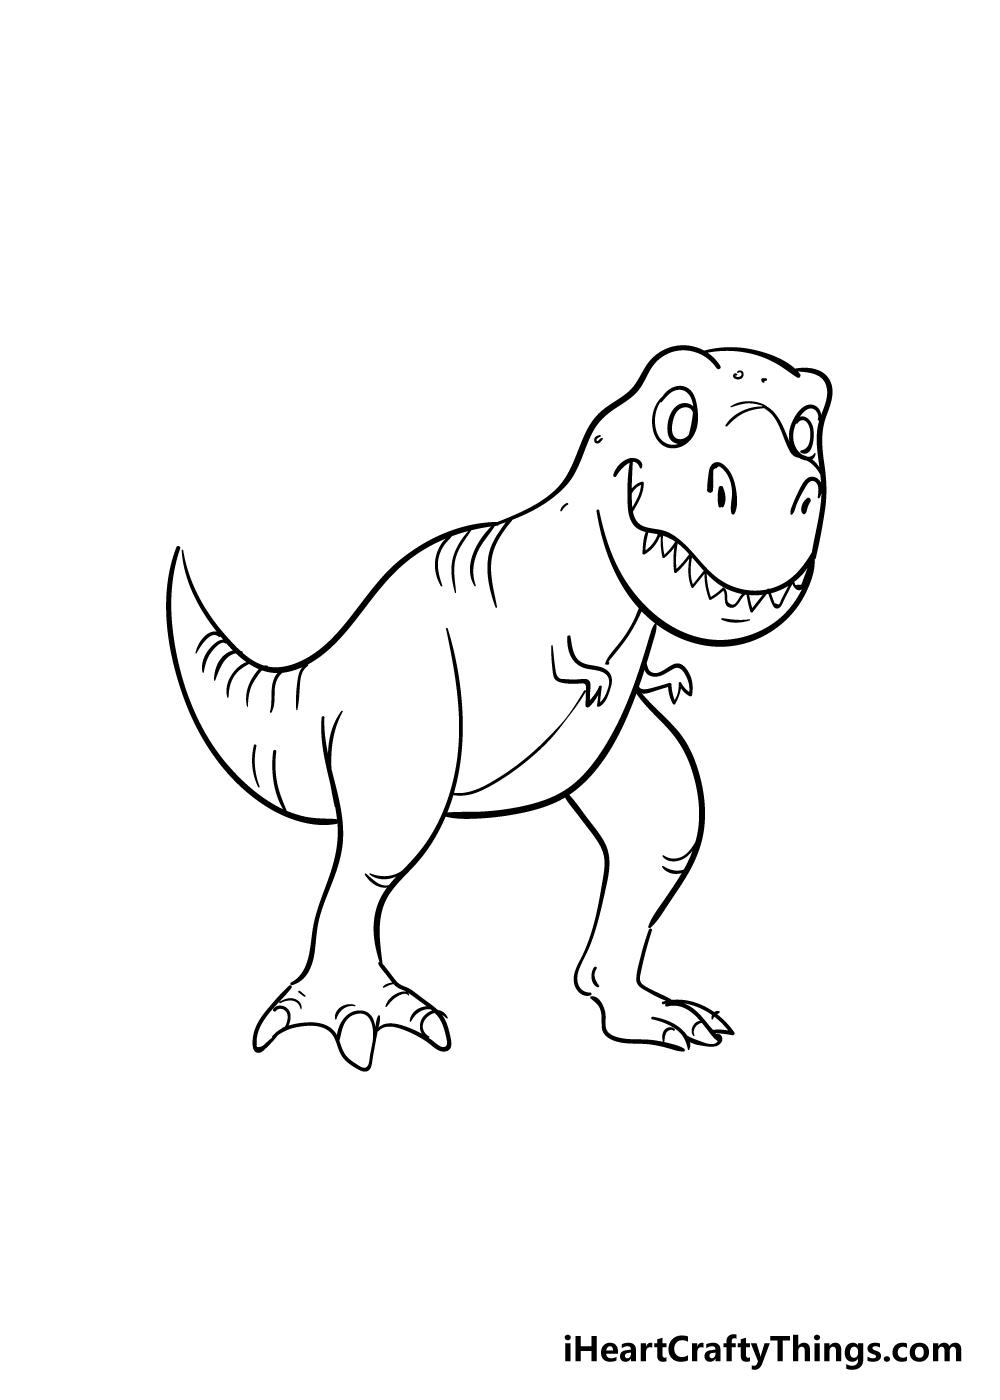 t-rex drawing step 8